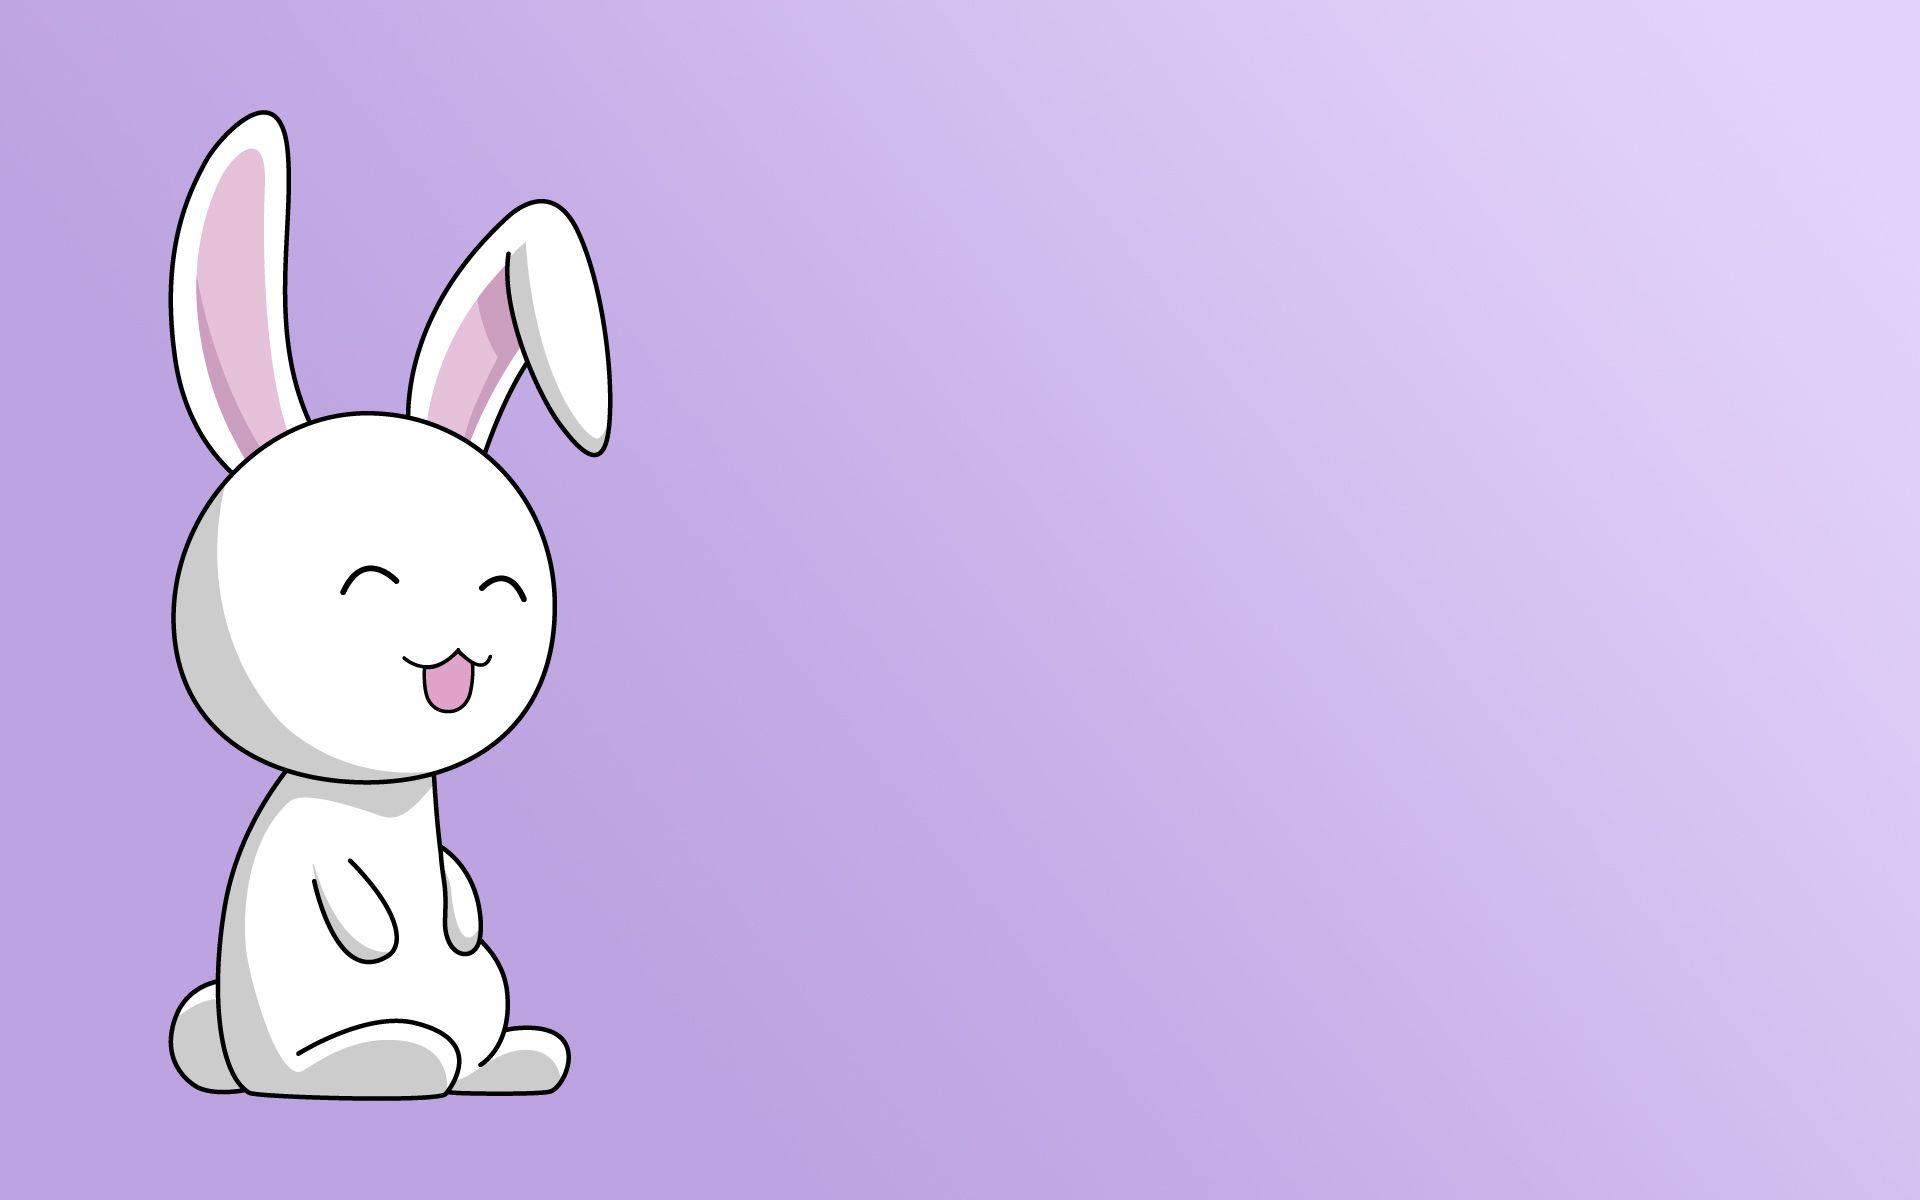 Bunny Wallpaper Bunny Wallpaper Easter Wallpaper Cute Iphone 6 Wallpaper